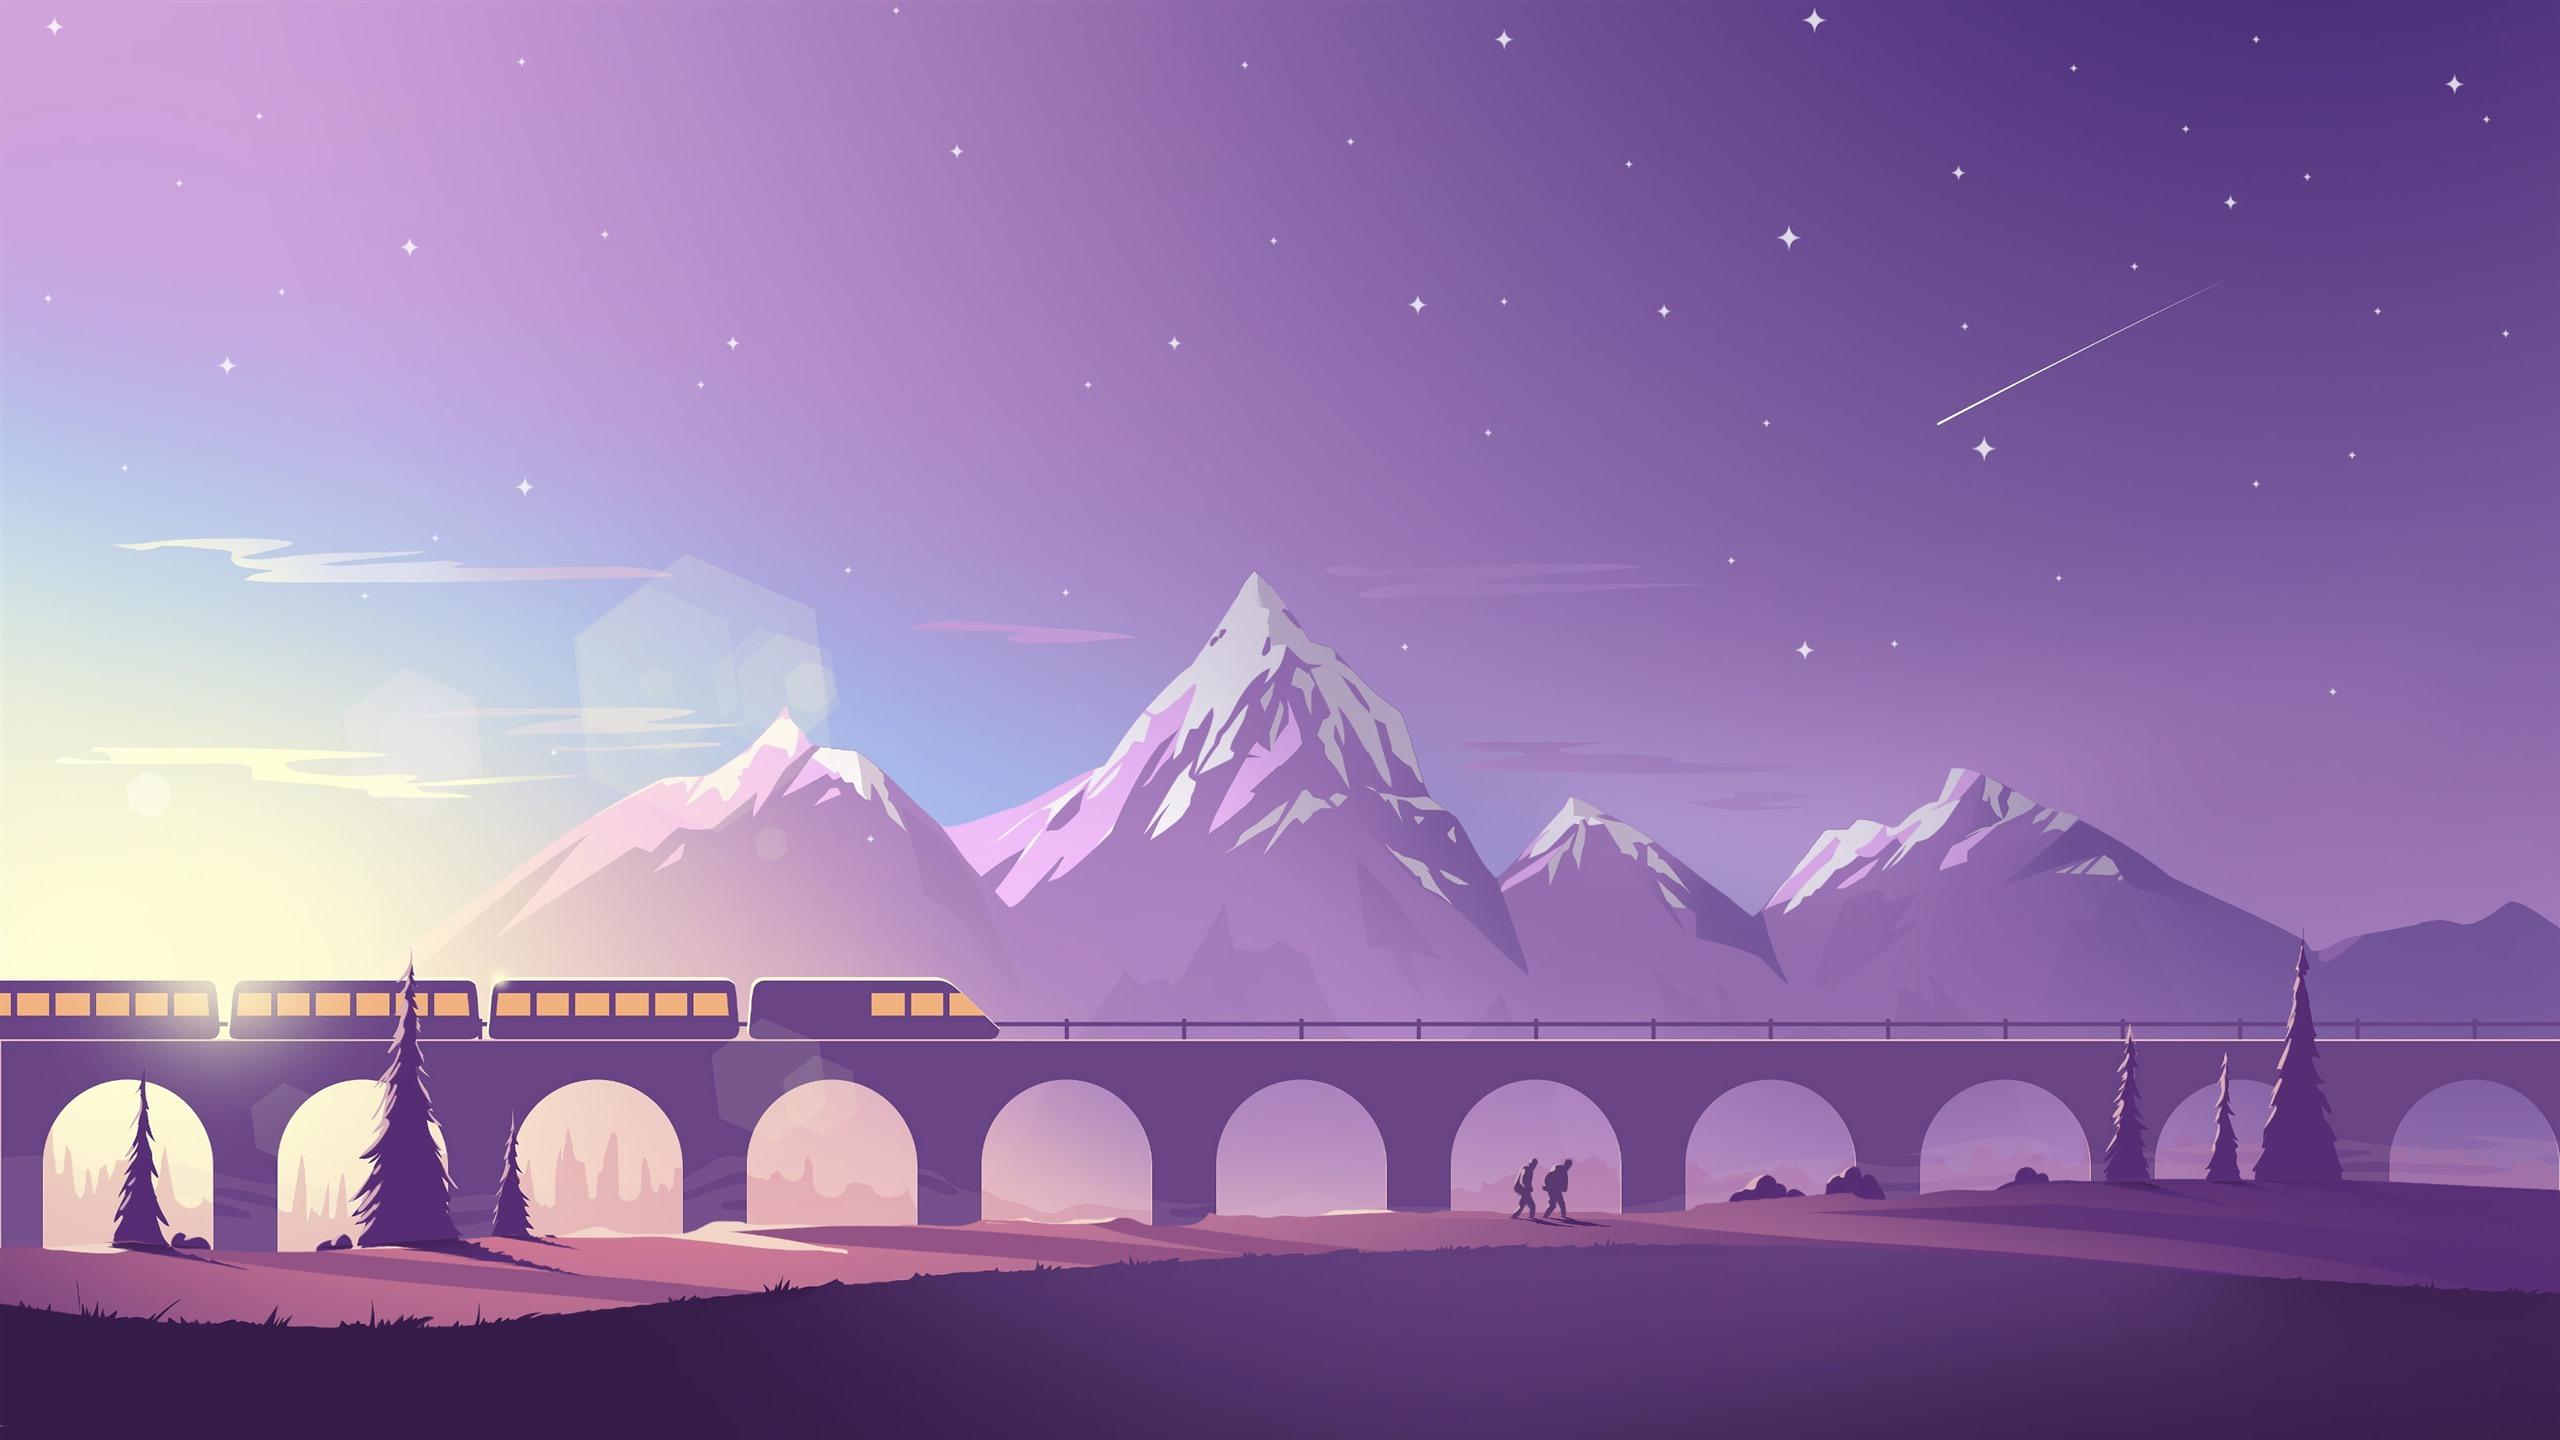 Bridge Train Mountains Vector Art Picture 1080x1920 Iphone 8 7